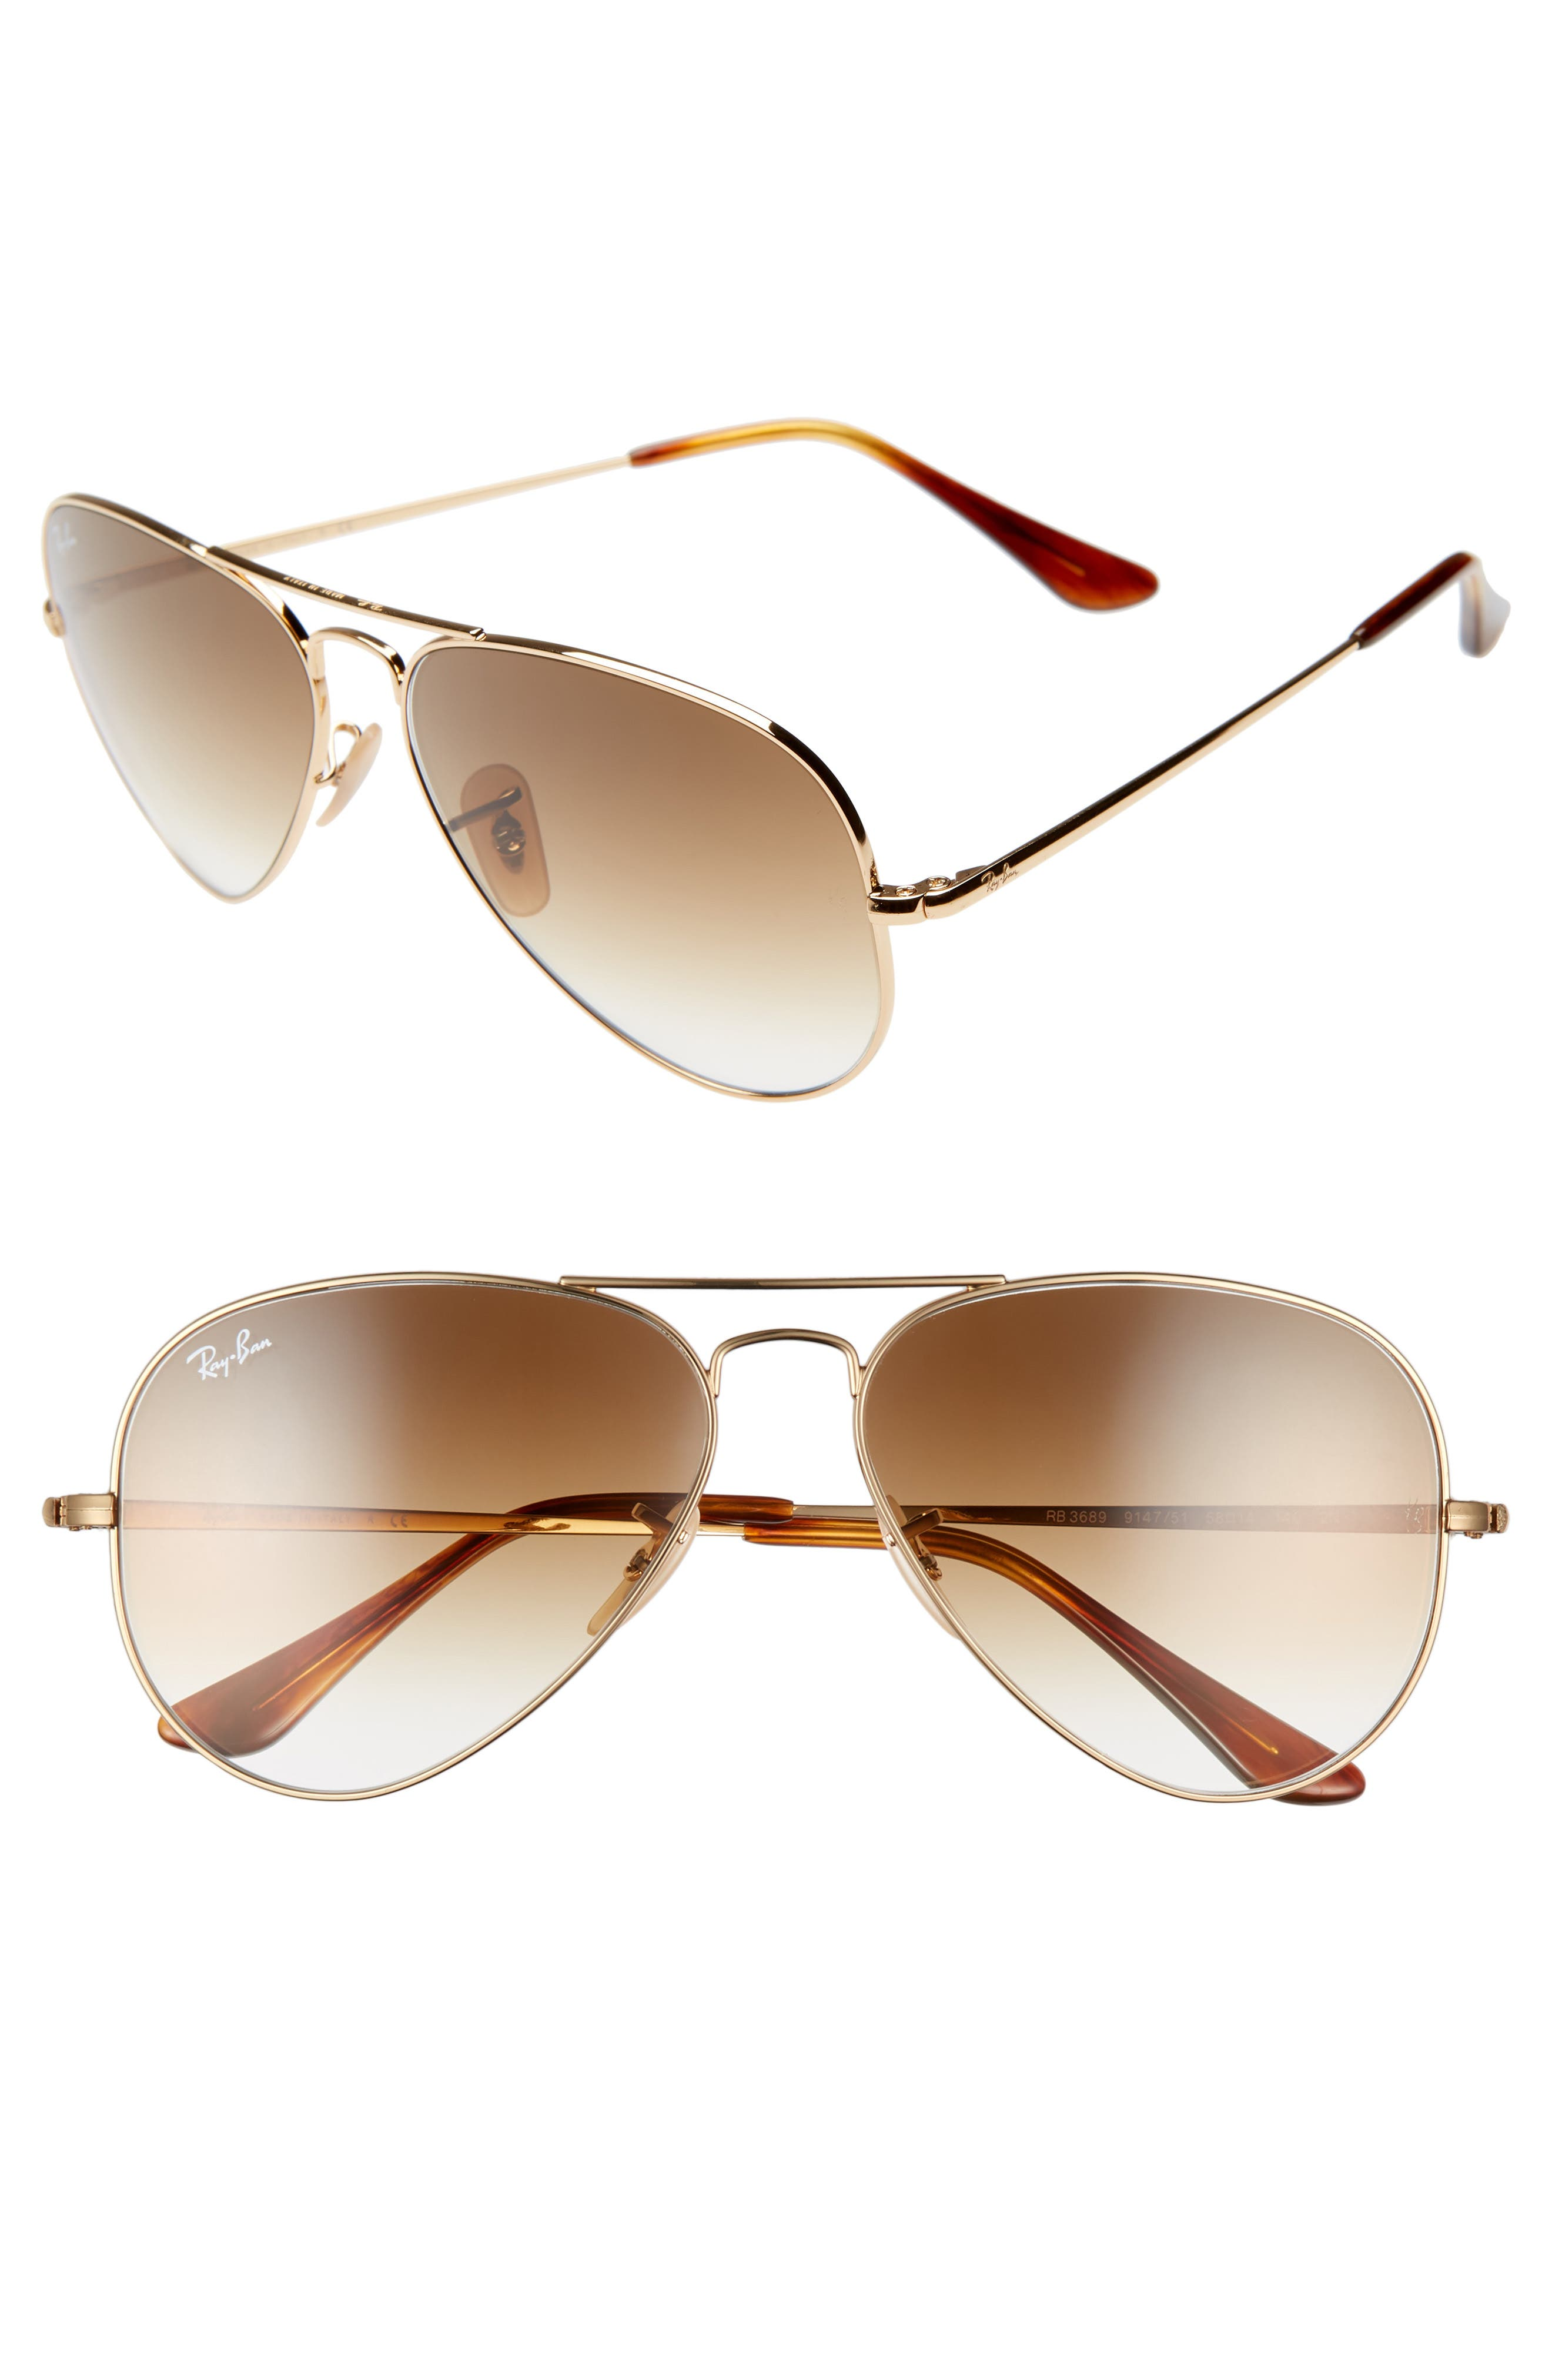 Ray-Ban 5m Aviator Sunglasses - Gold/ Brown Gradient